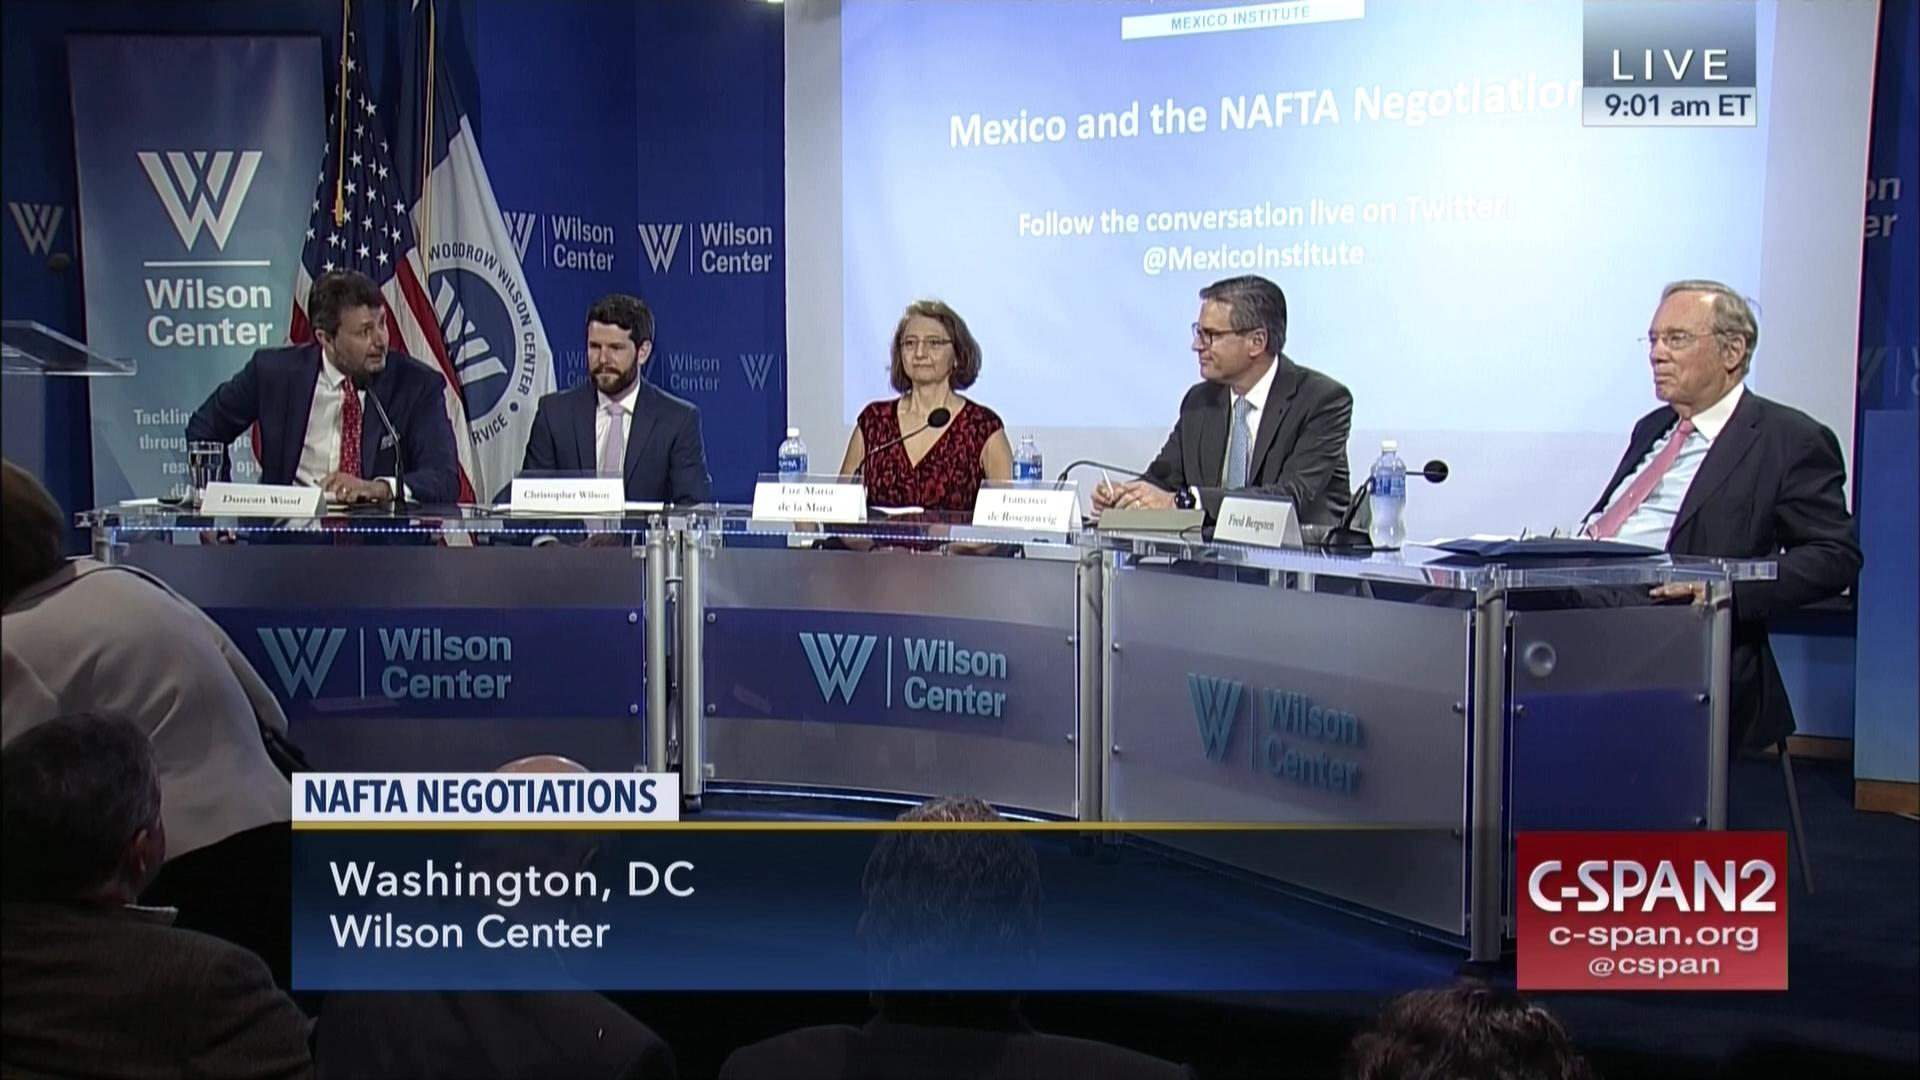 Panelists Discuss NAFTA Negotiations, Aug 15 2017 | Video | C-SPAN.org